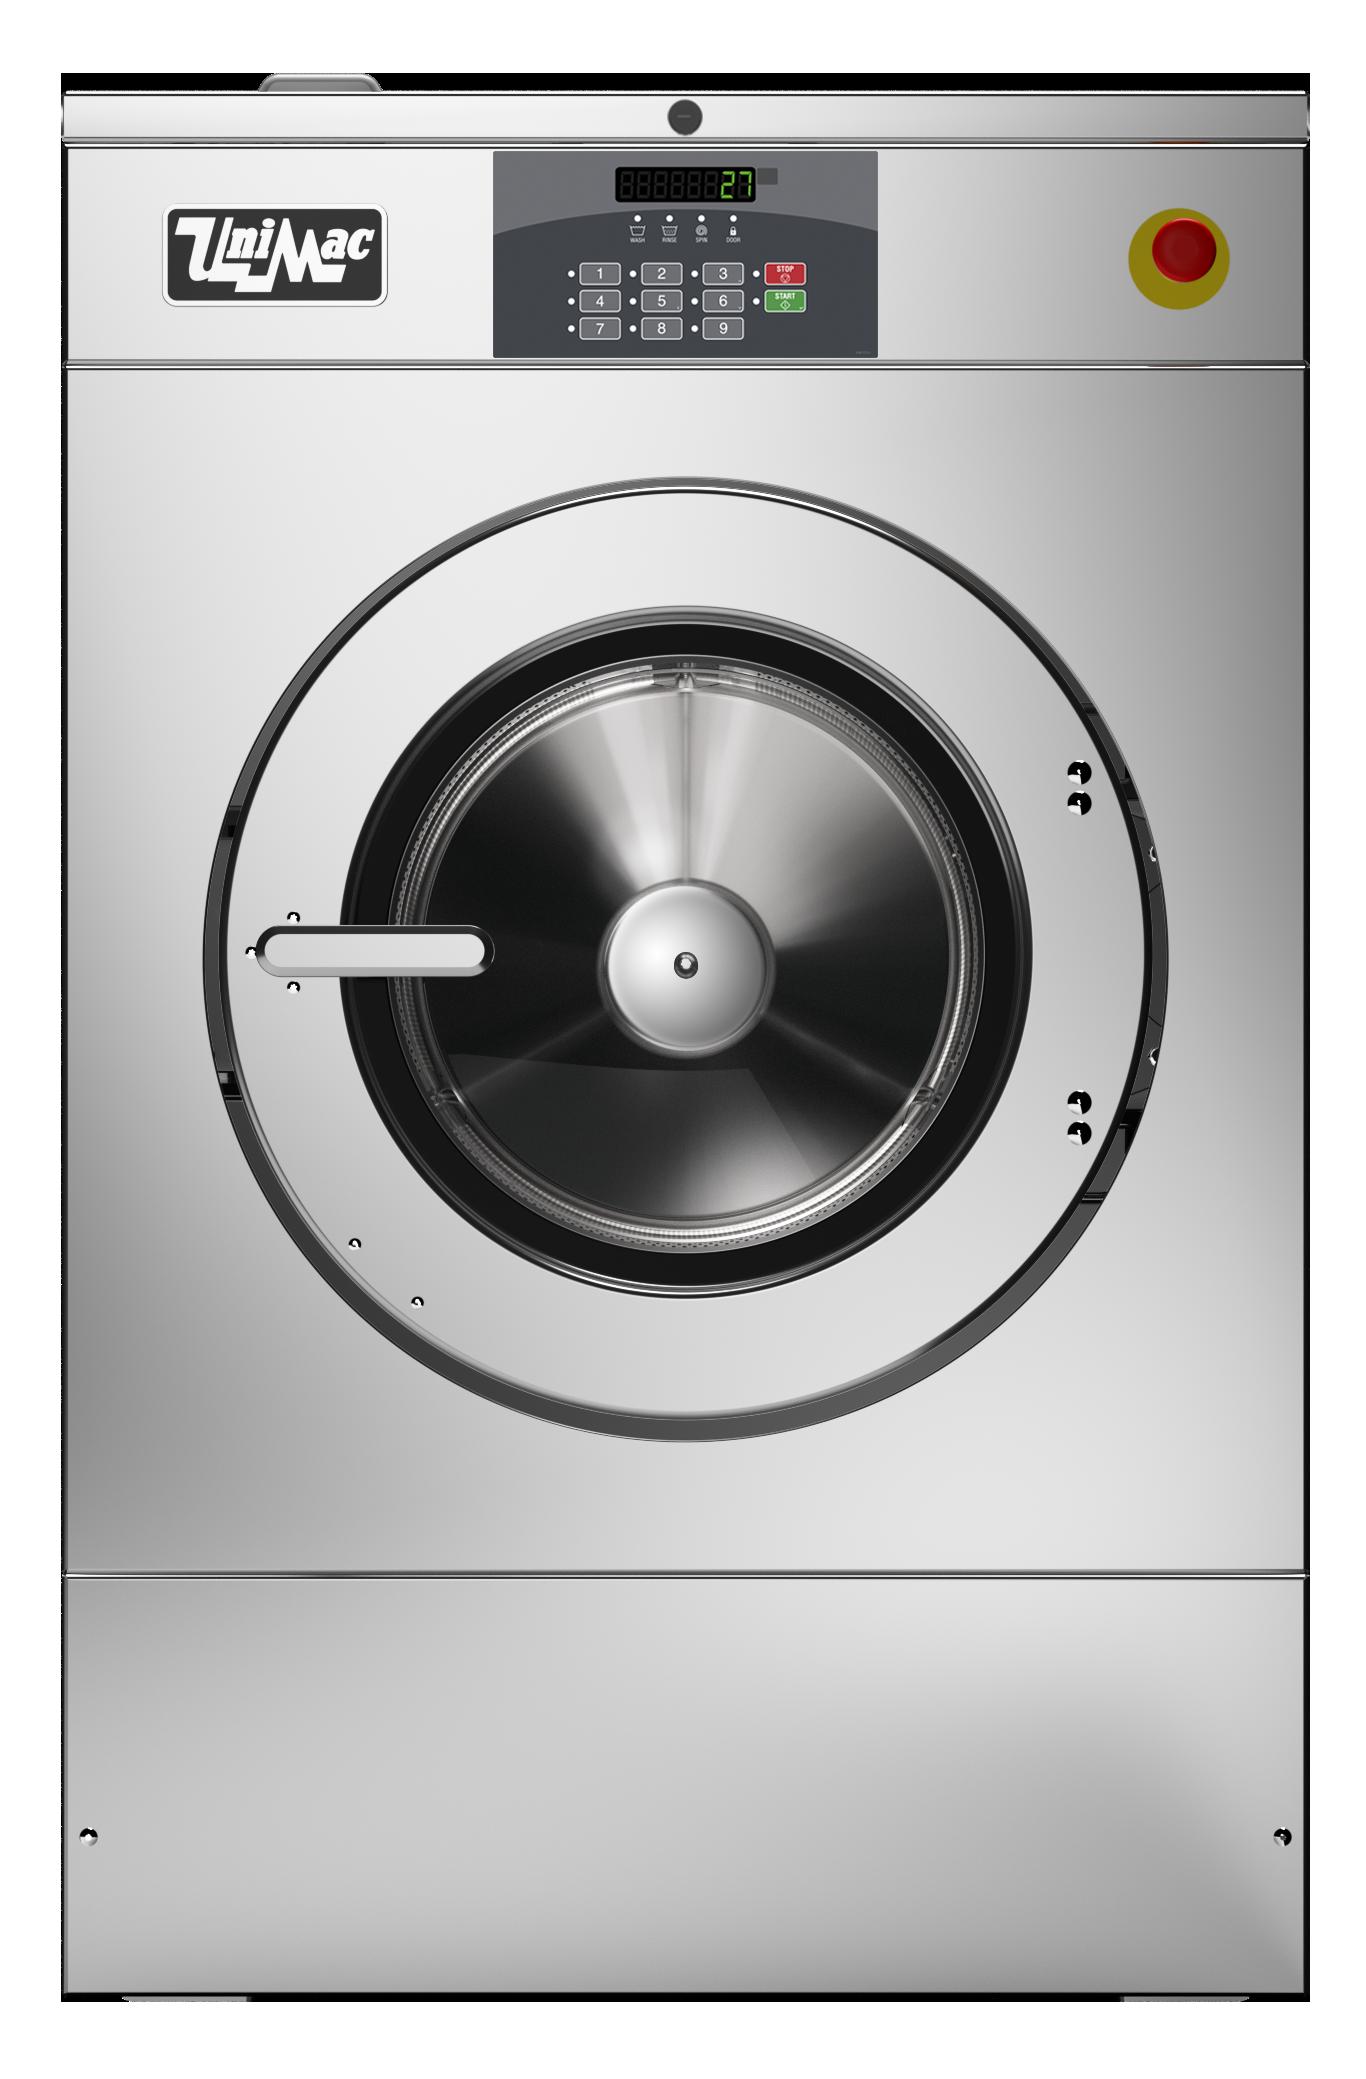 UniMac Economy Washers - Daniels Equipment on